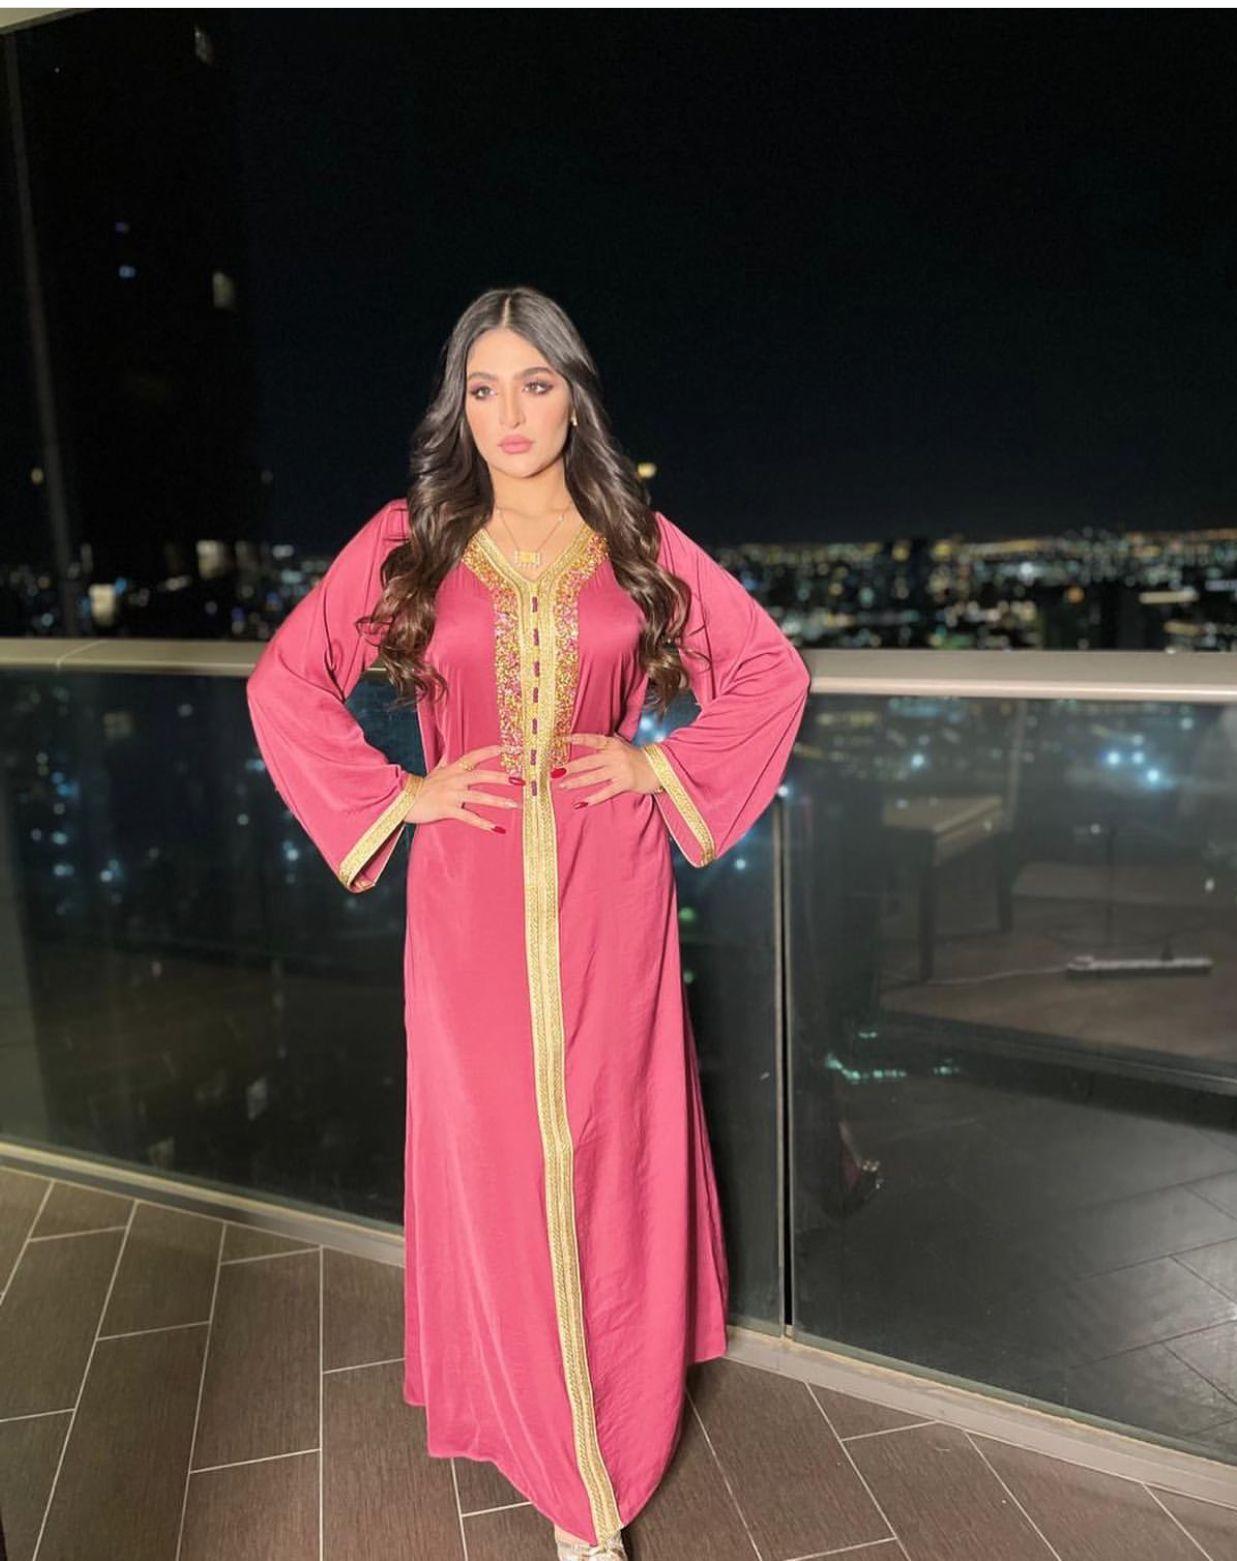 Eid Mubarak Dubai Abaya Turkey Muslim Fashion Abayas Dresses for Women Islam Clothing Jalabiya Indian Dress Caftan Kaftan Robes